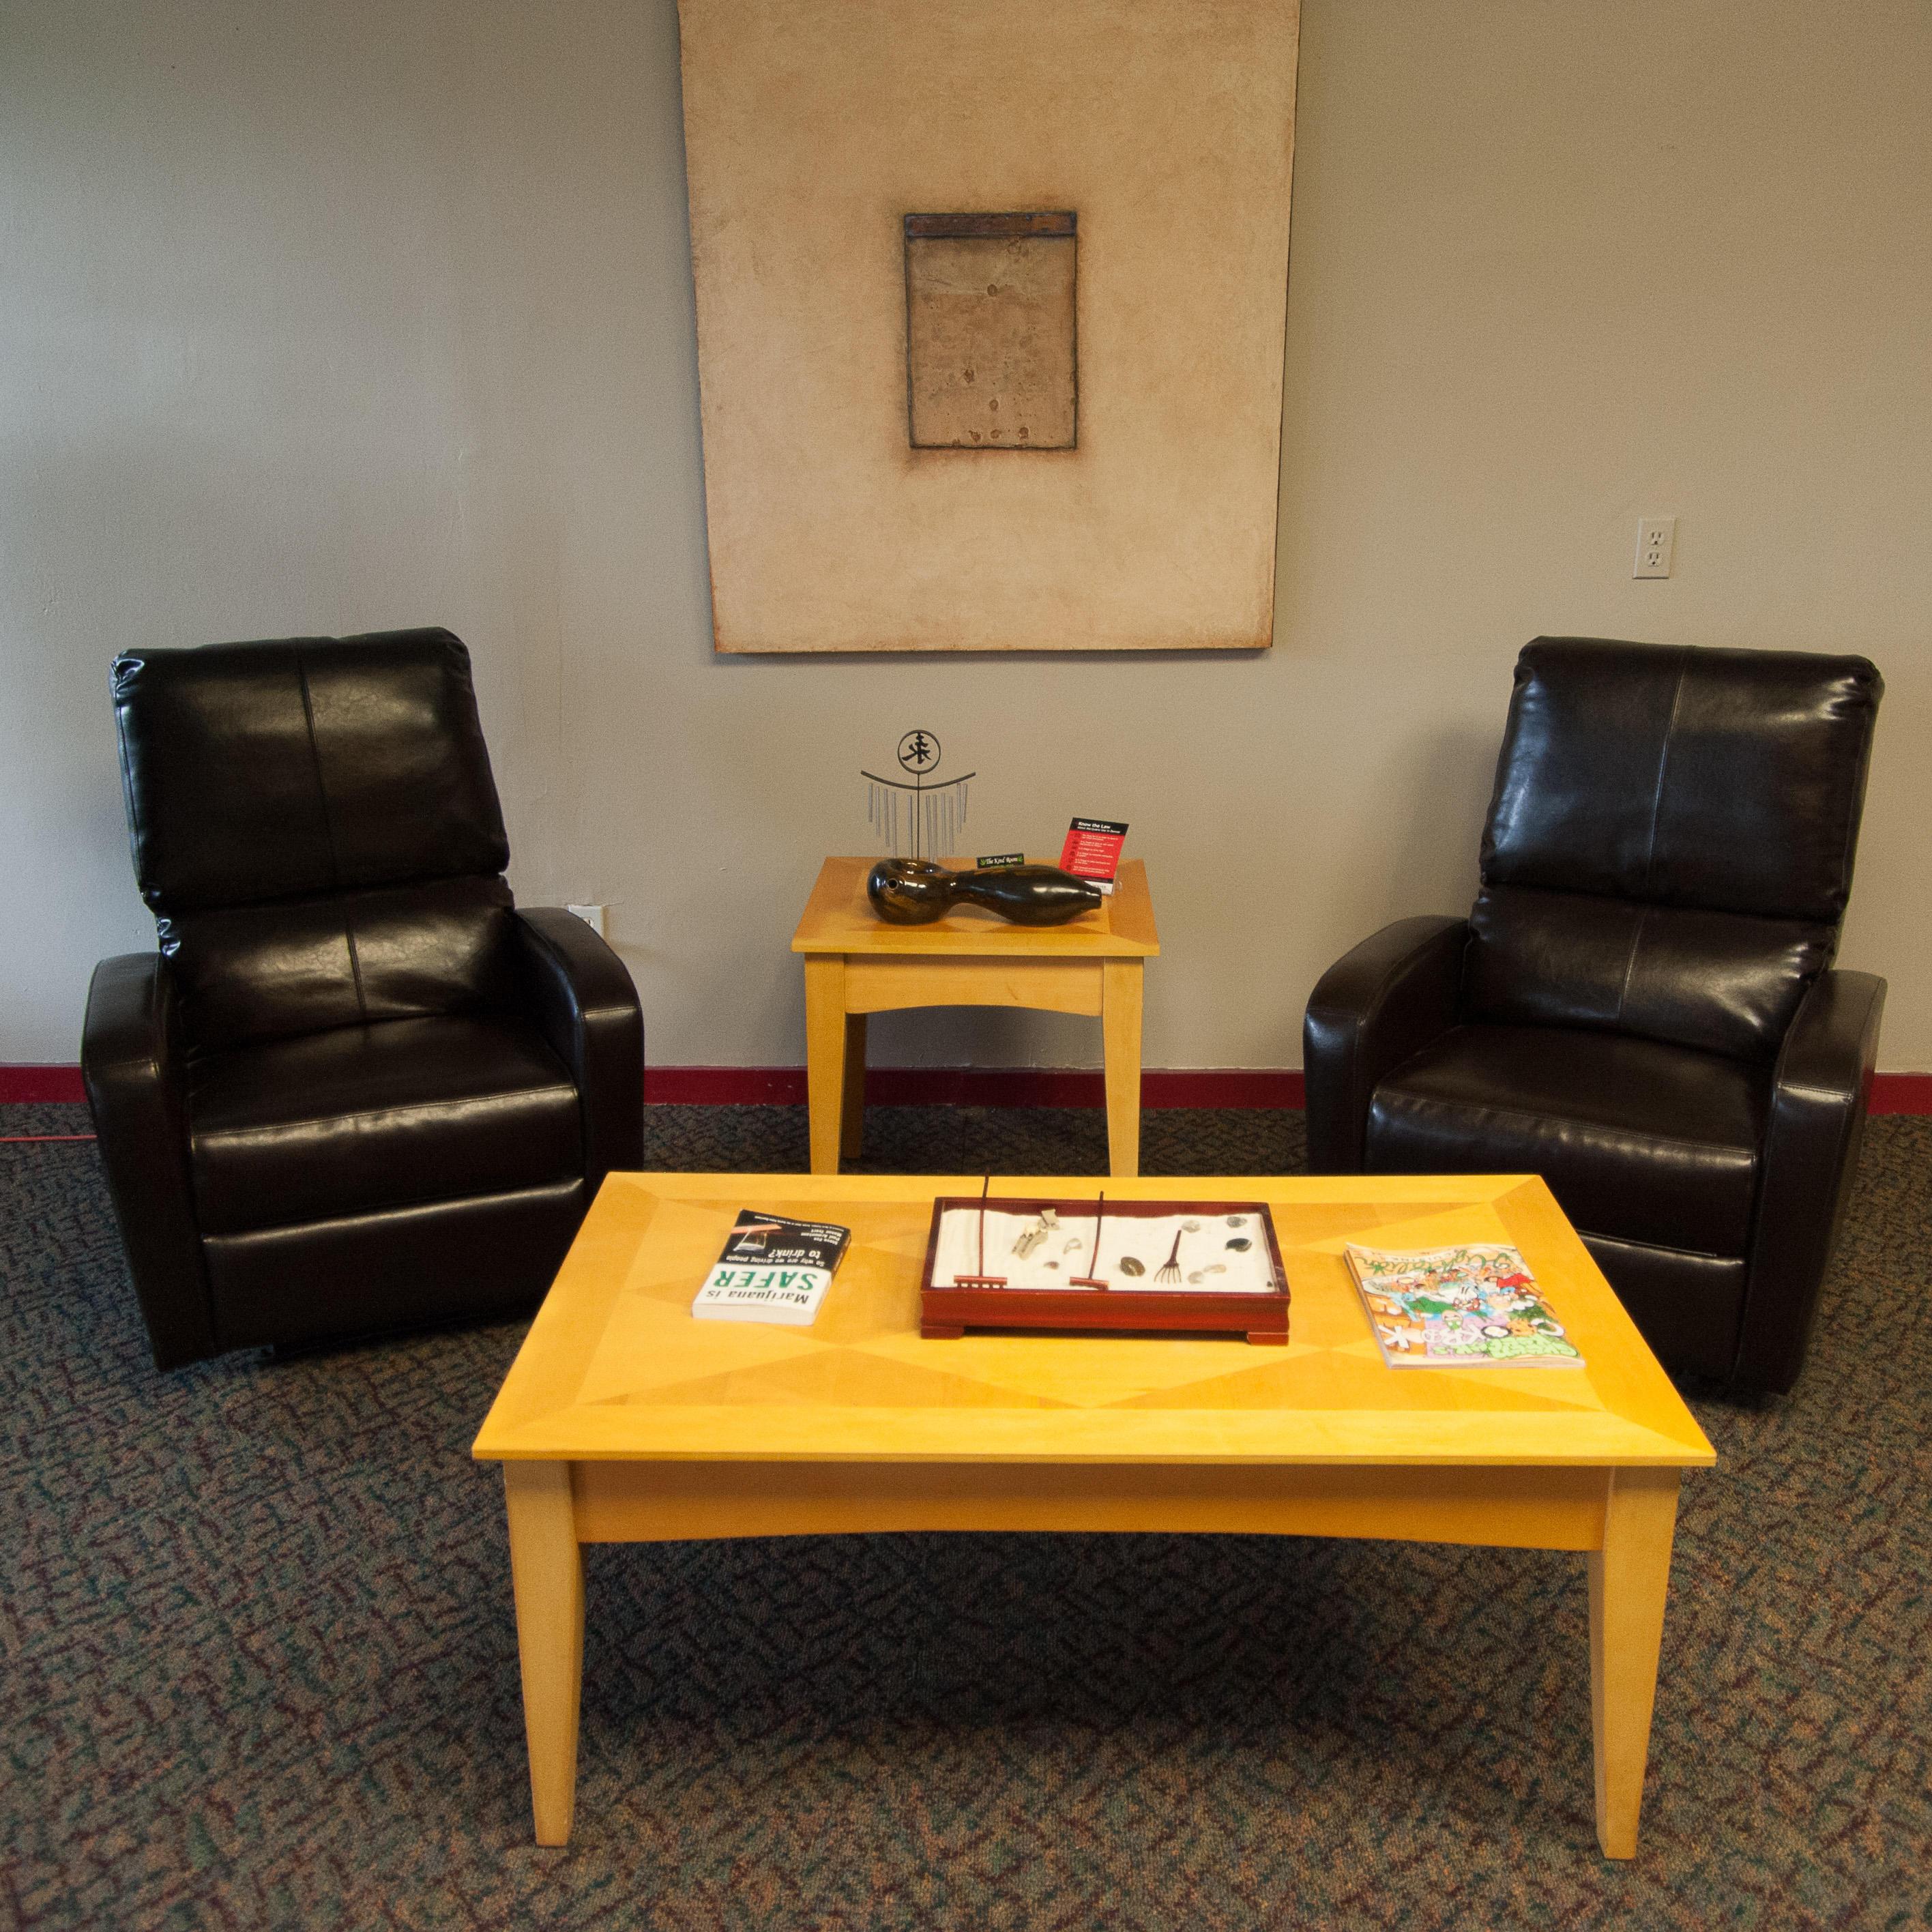 The Kind Room - Recreational | Medical - Cannabis Dispensary image 3